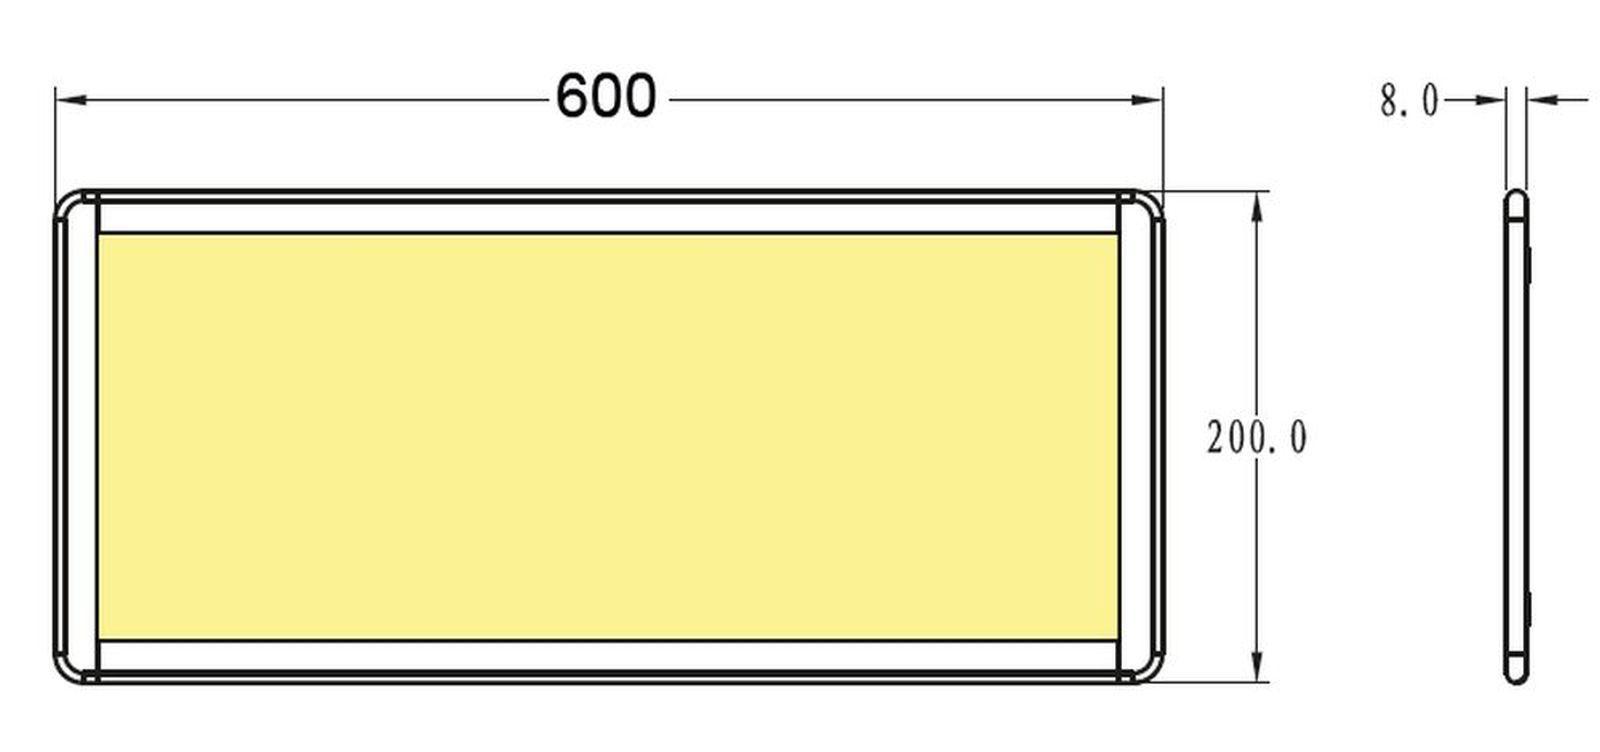 led panel unterbauleuchte k che 600 x 200 x 80 mm lido 15 w warmwei 554065 kaufen bei. Black Bedroom Furniture Sets. Home Design Ideas